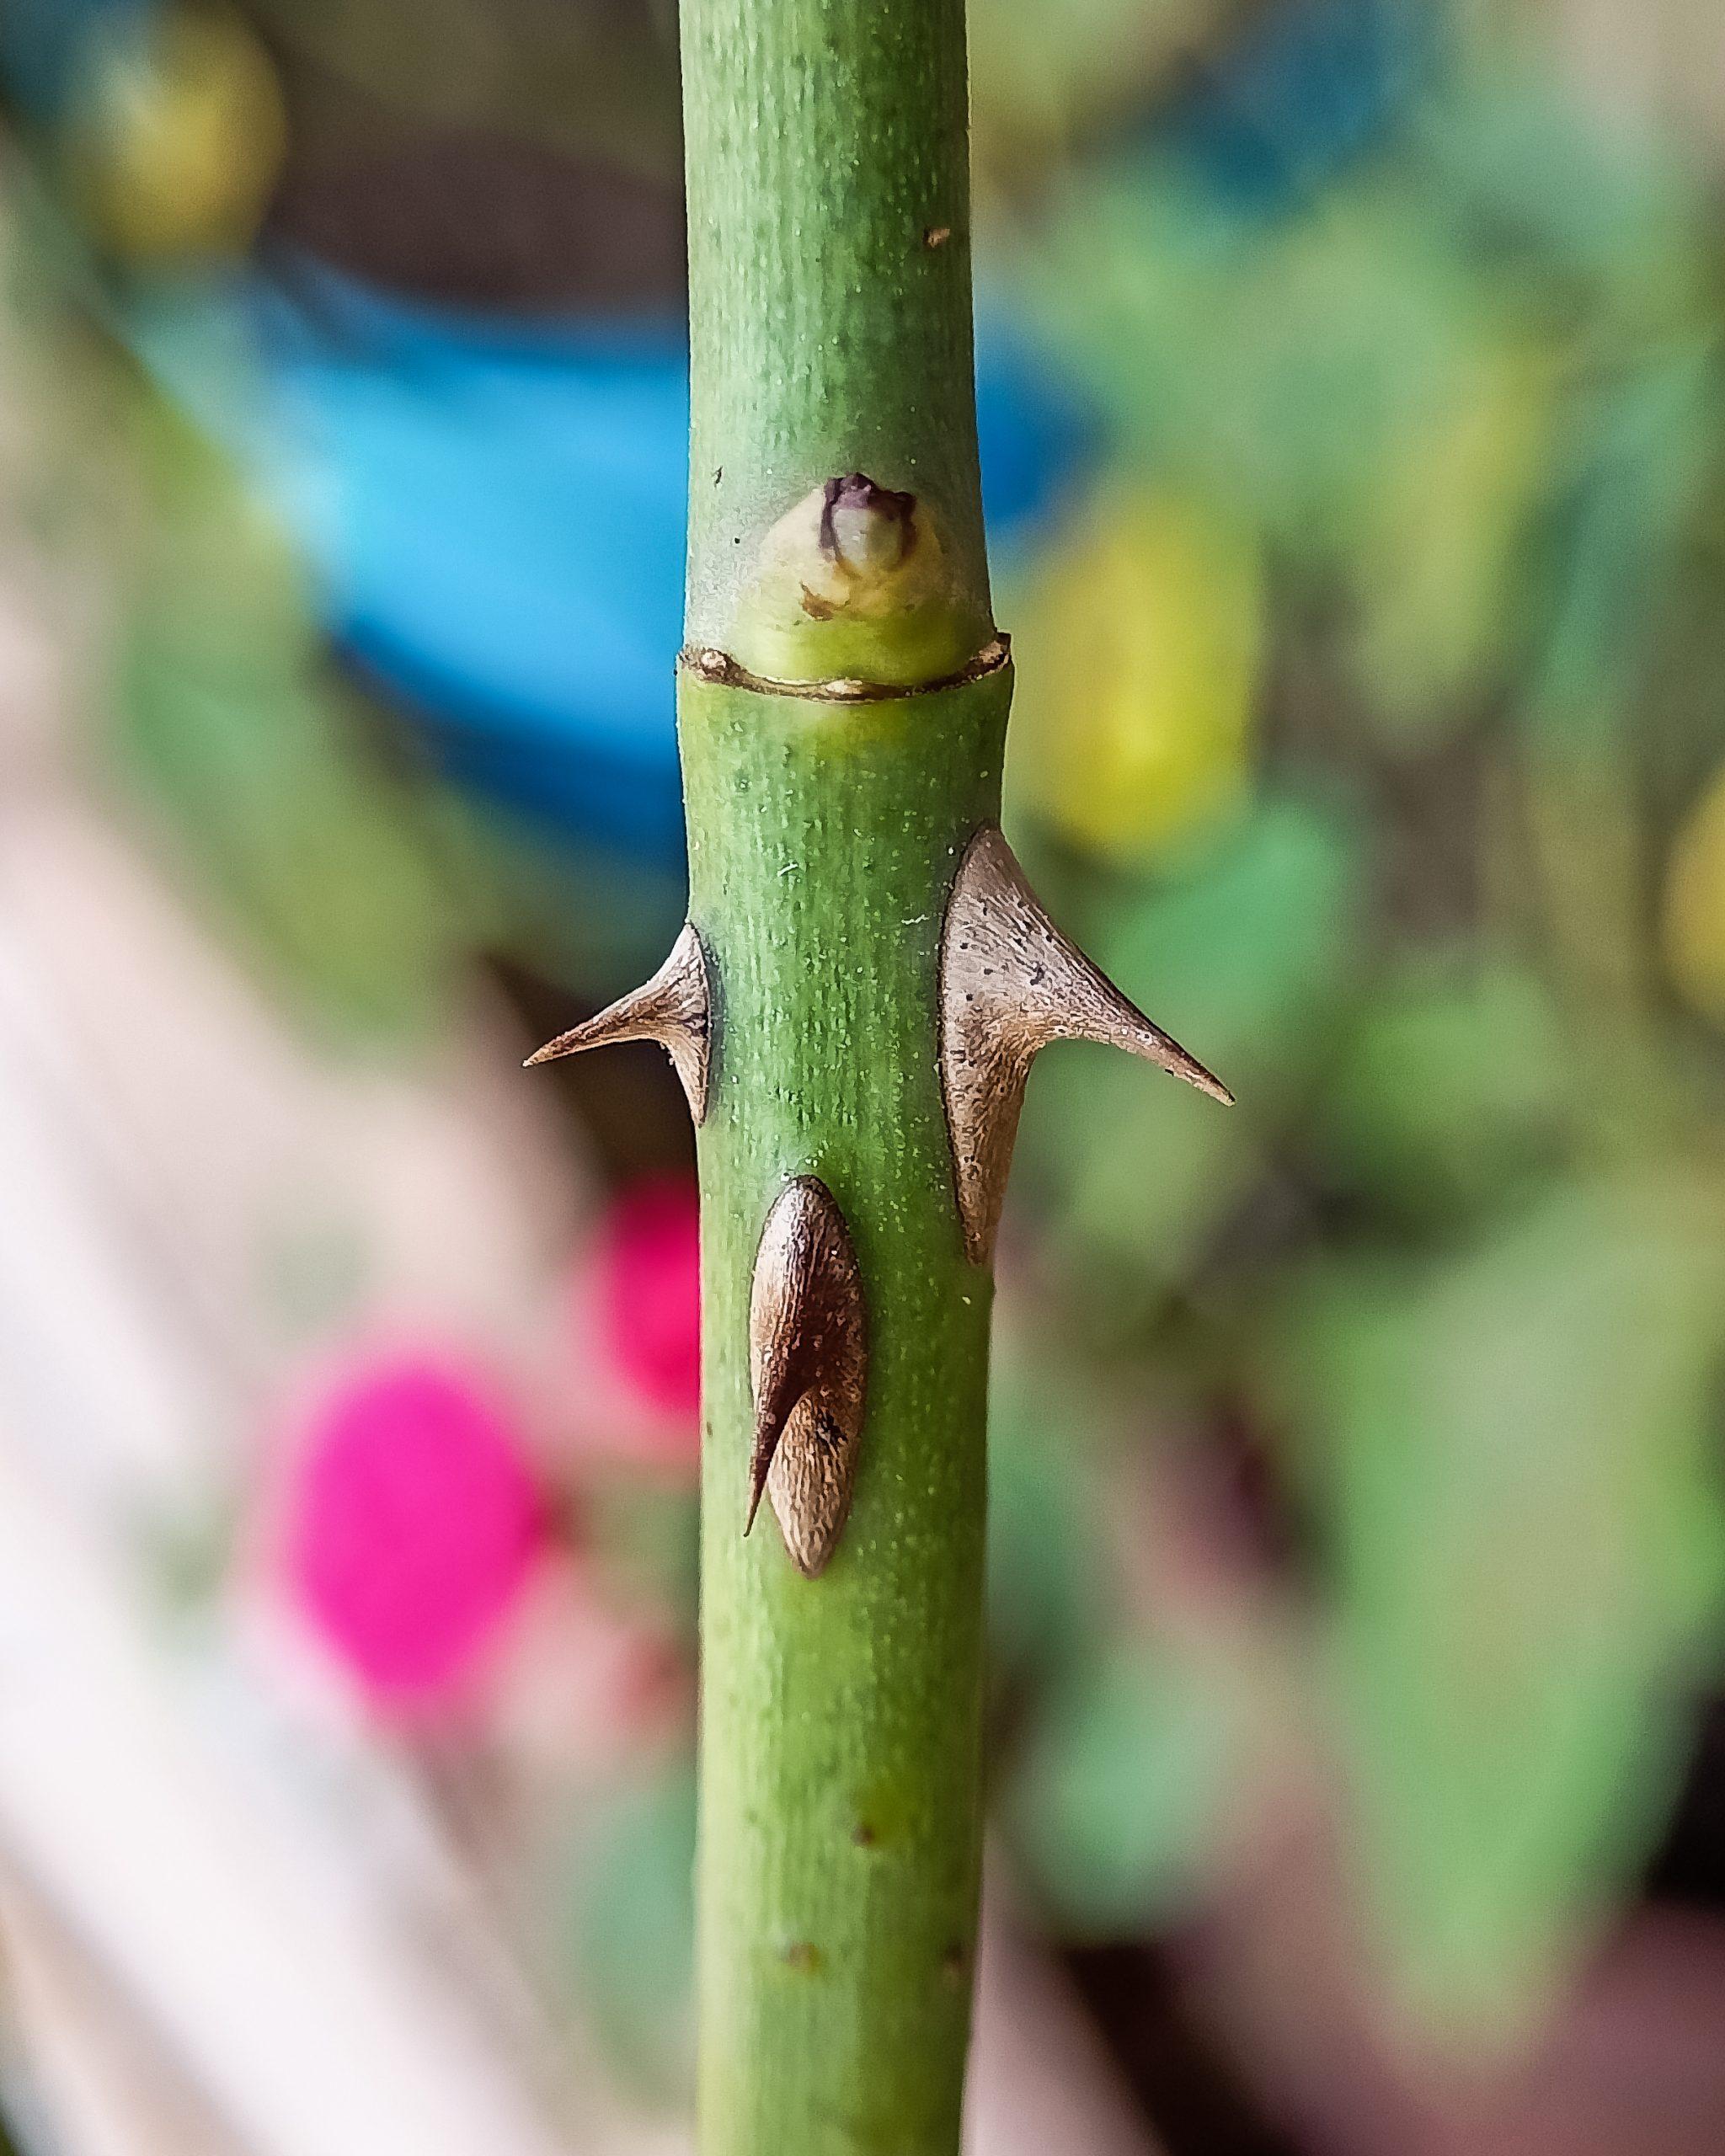 A rose plant stem